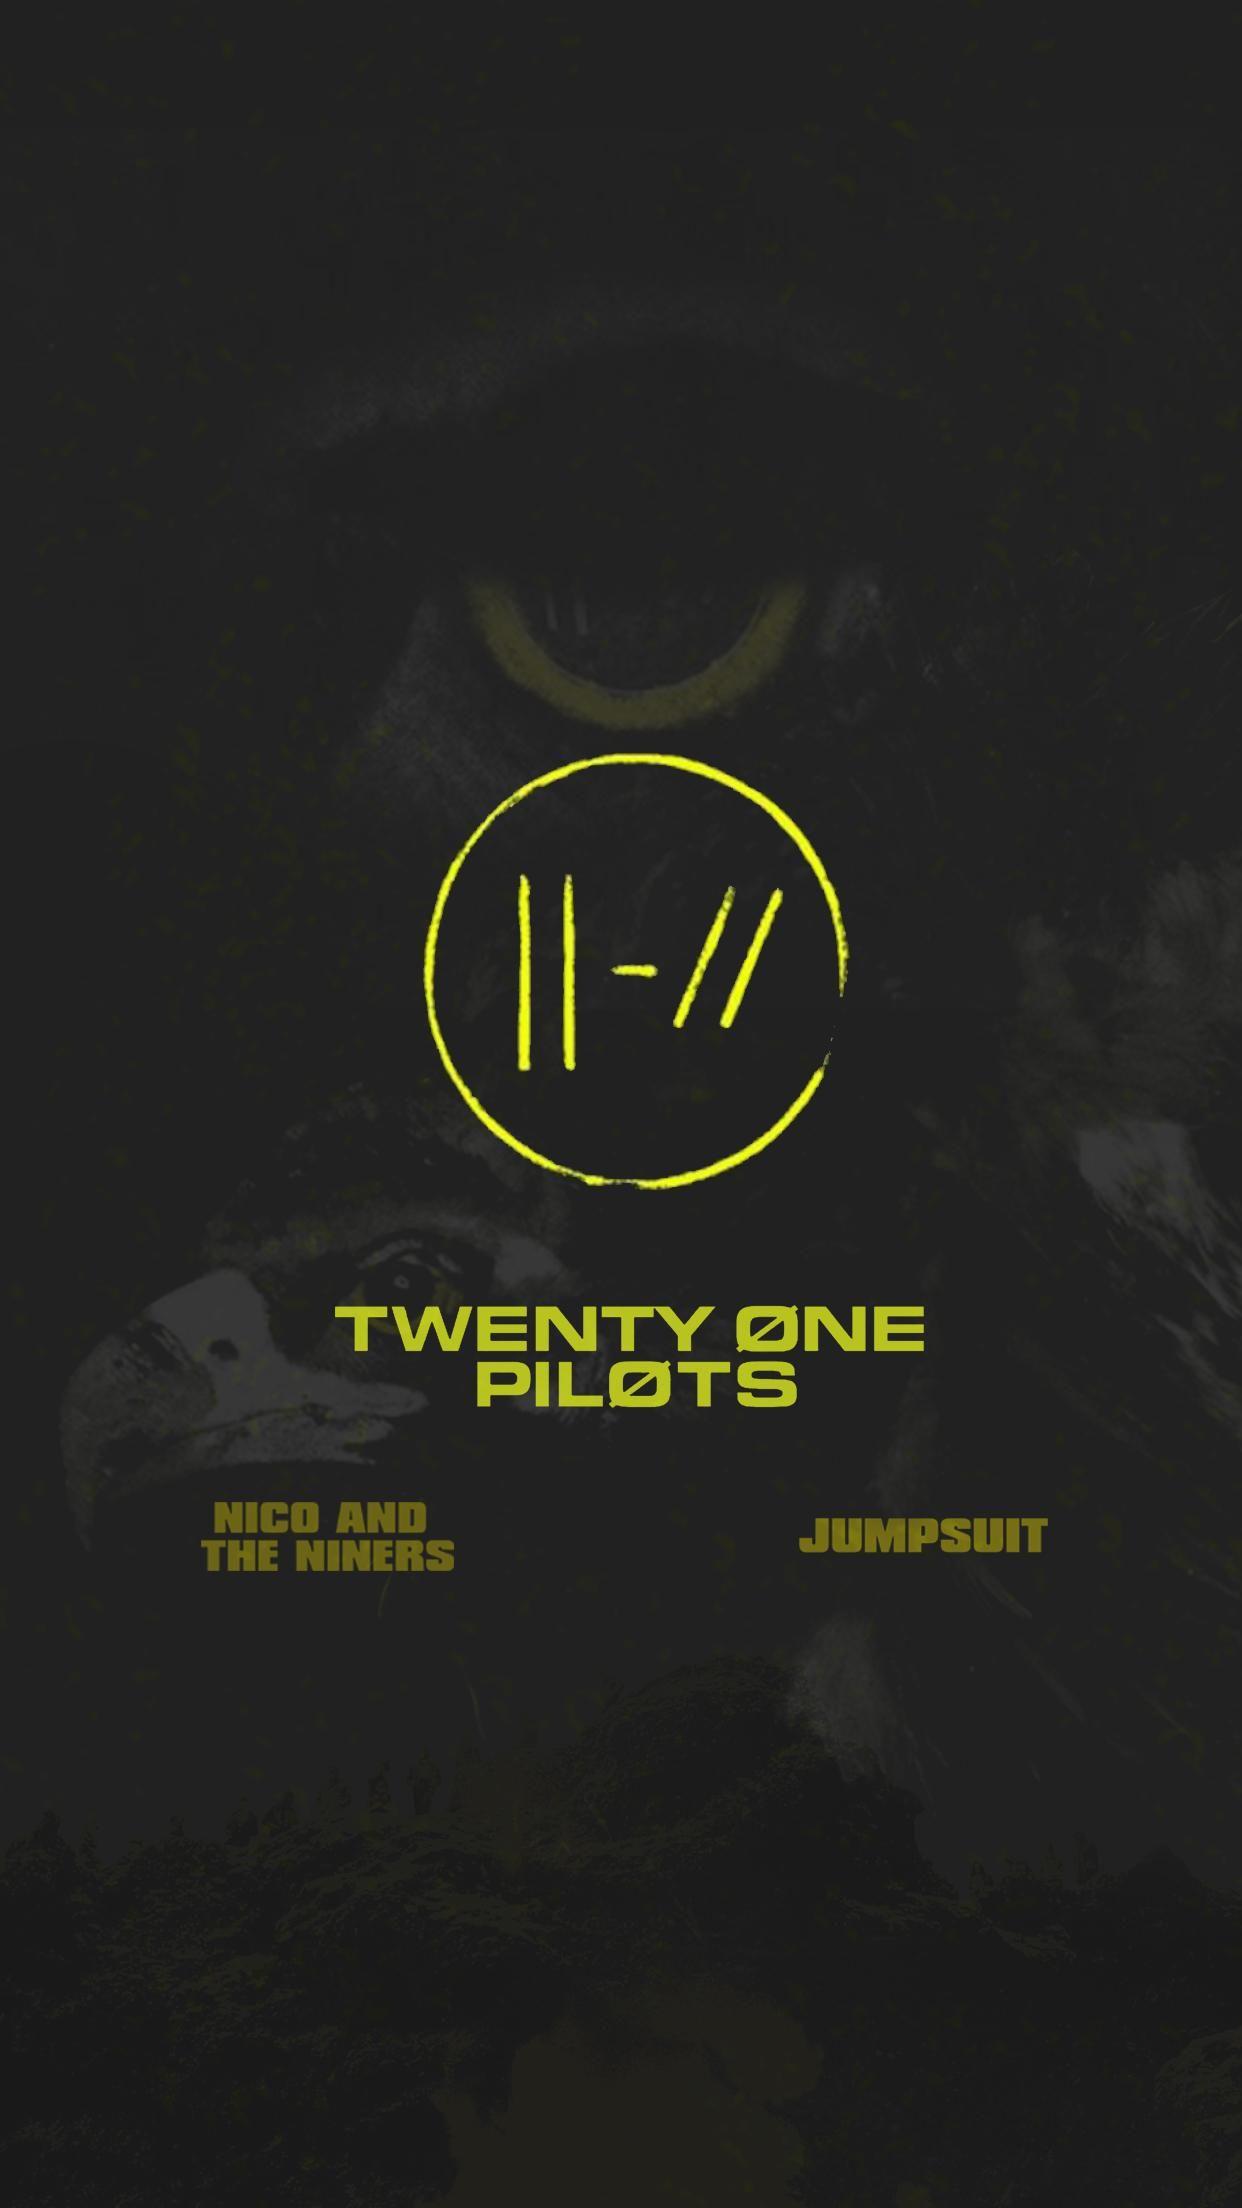 Twenty One Pilots Iphone Wallpapers Top Free Twenty One Pilots Iphone Backgrounds Wallpaperaccess Twenty One Pilots Wallpaper Twenty One Pilots One Pilots